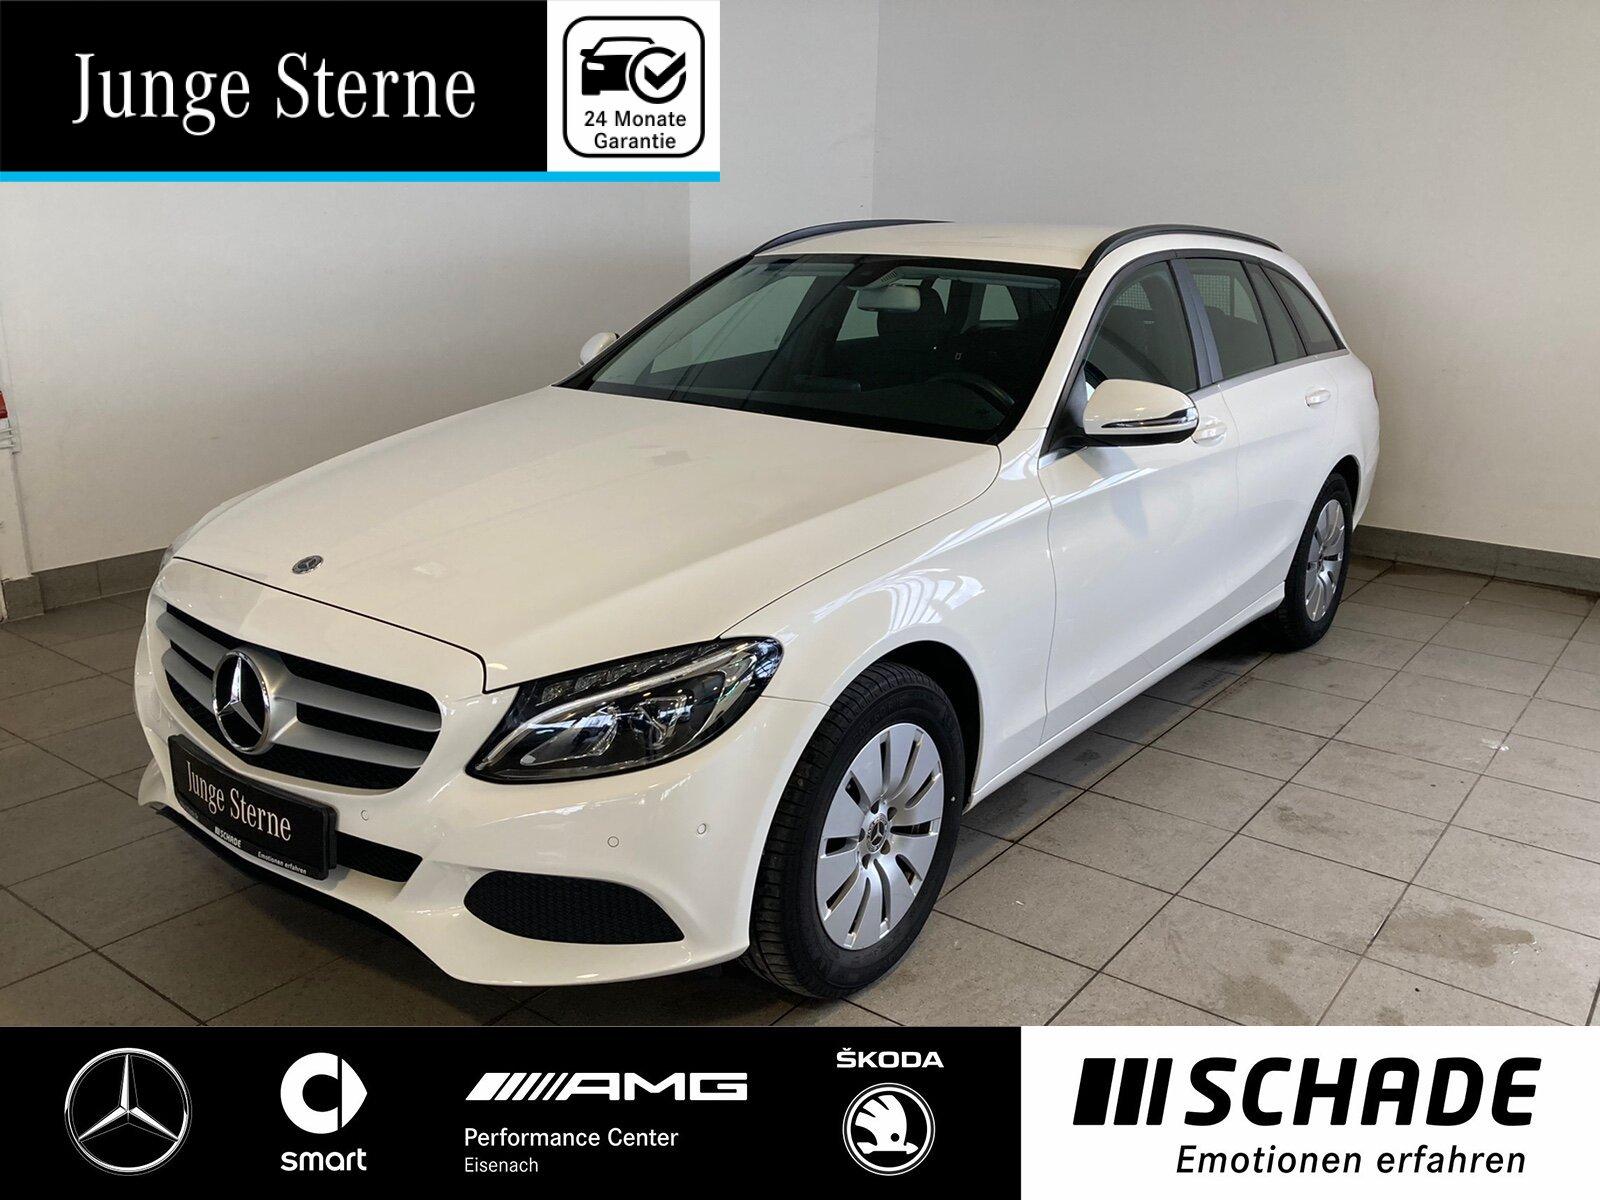 Mercedes-Benz C 200 d T Navi*LED*Sitzheizung*Park-Assis*1.Hand, Jahr 2017, Diesel